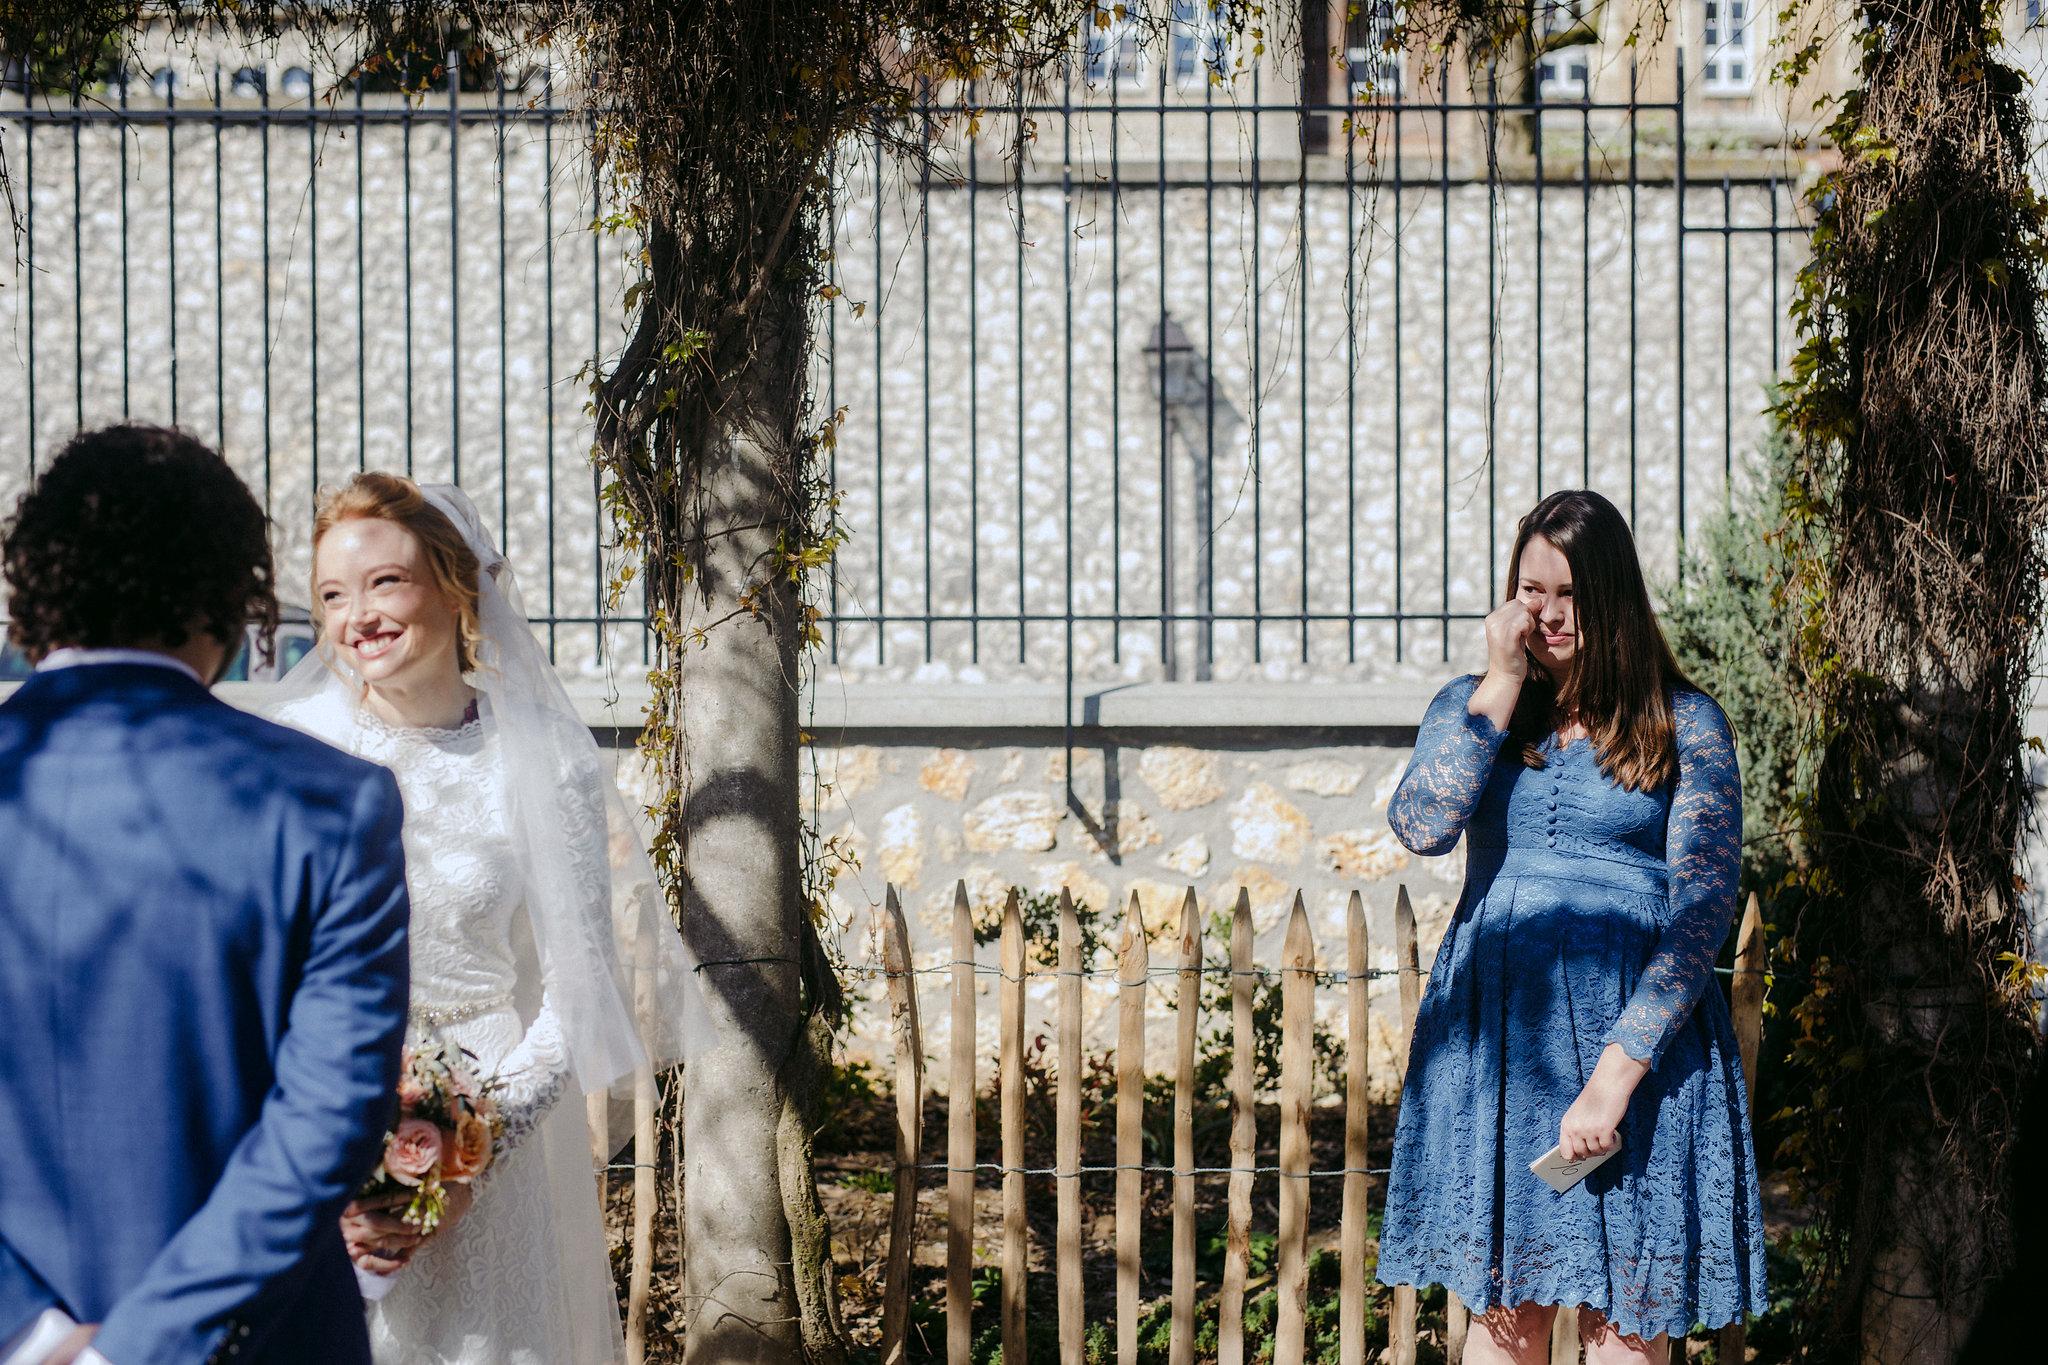 Paris_elopement_wedding_photographer-155.jpg